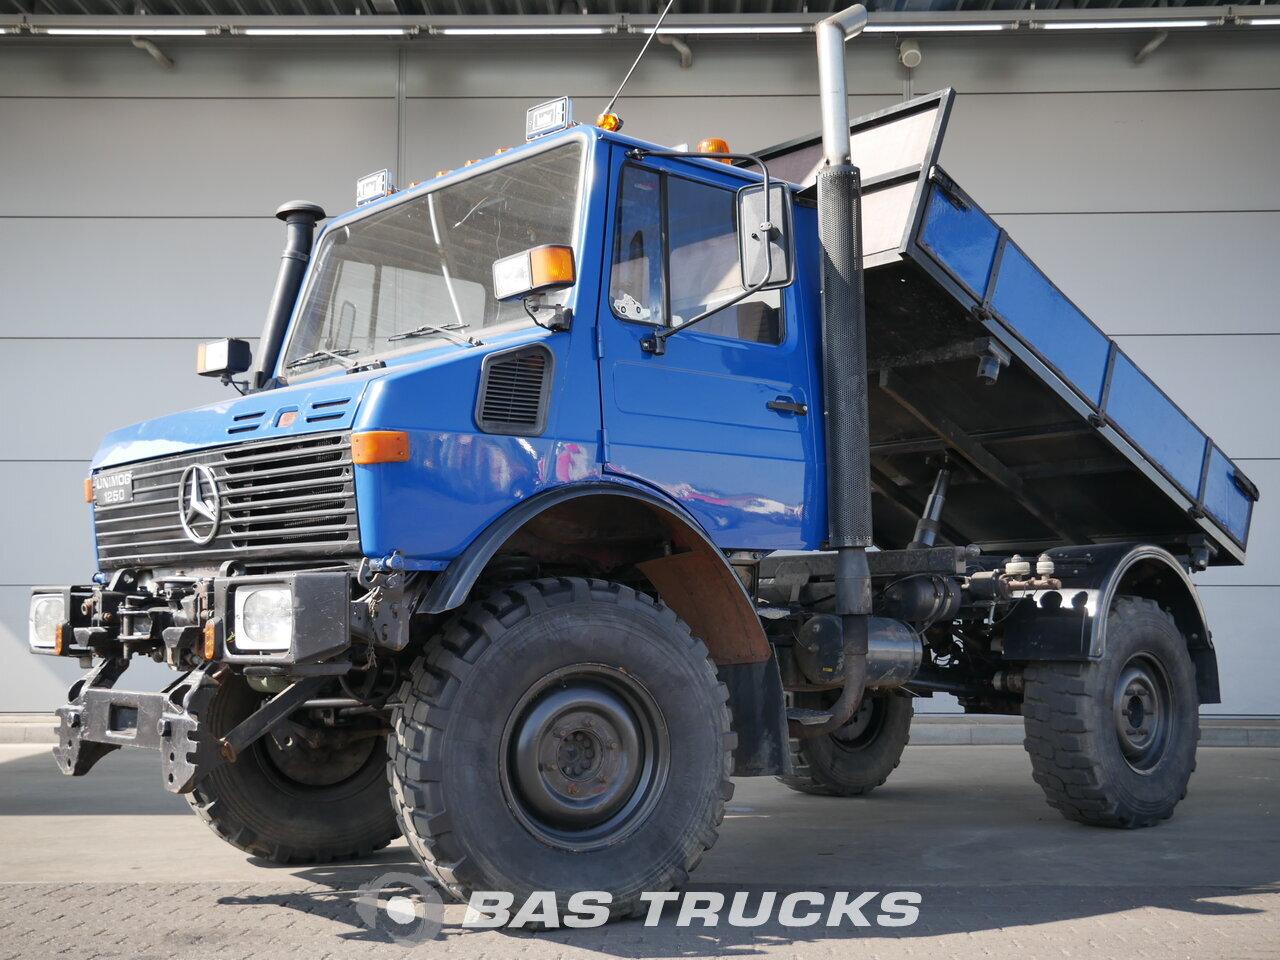 unimog u1250 truck euro norm 0 14200 bas trucks. Black Bedroom Furniture Sets. Home Design Ideas